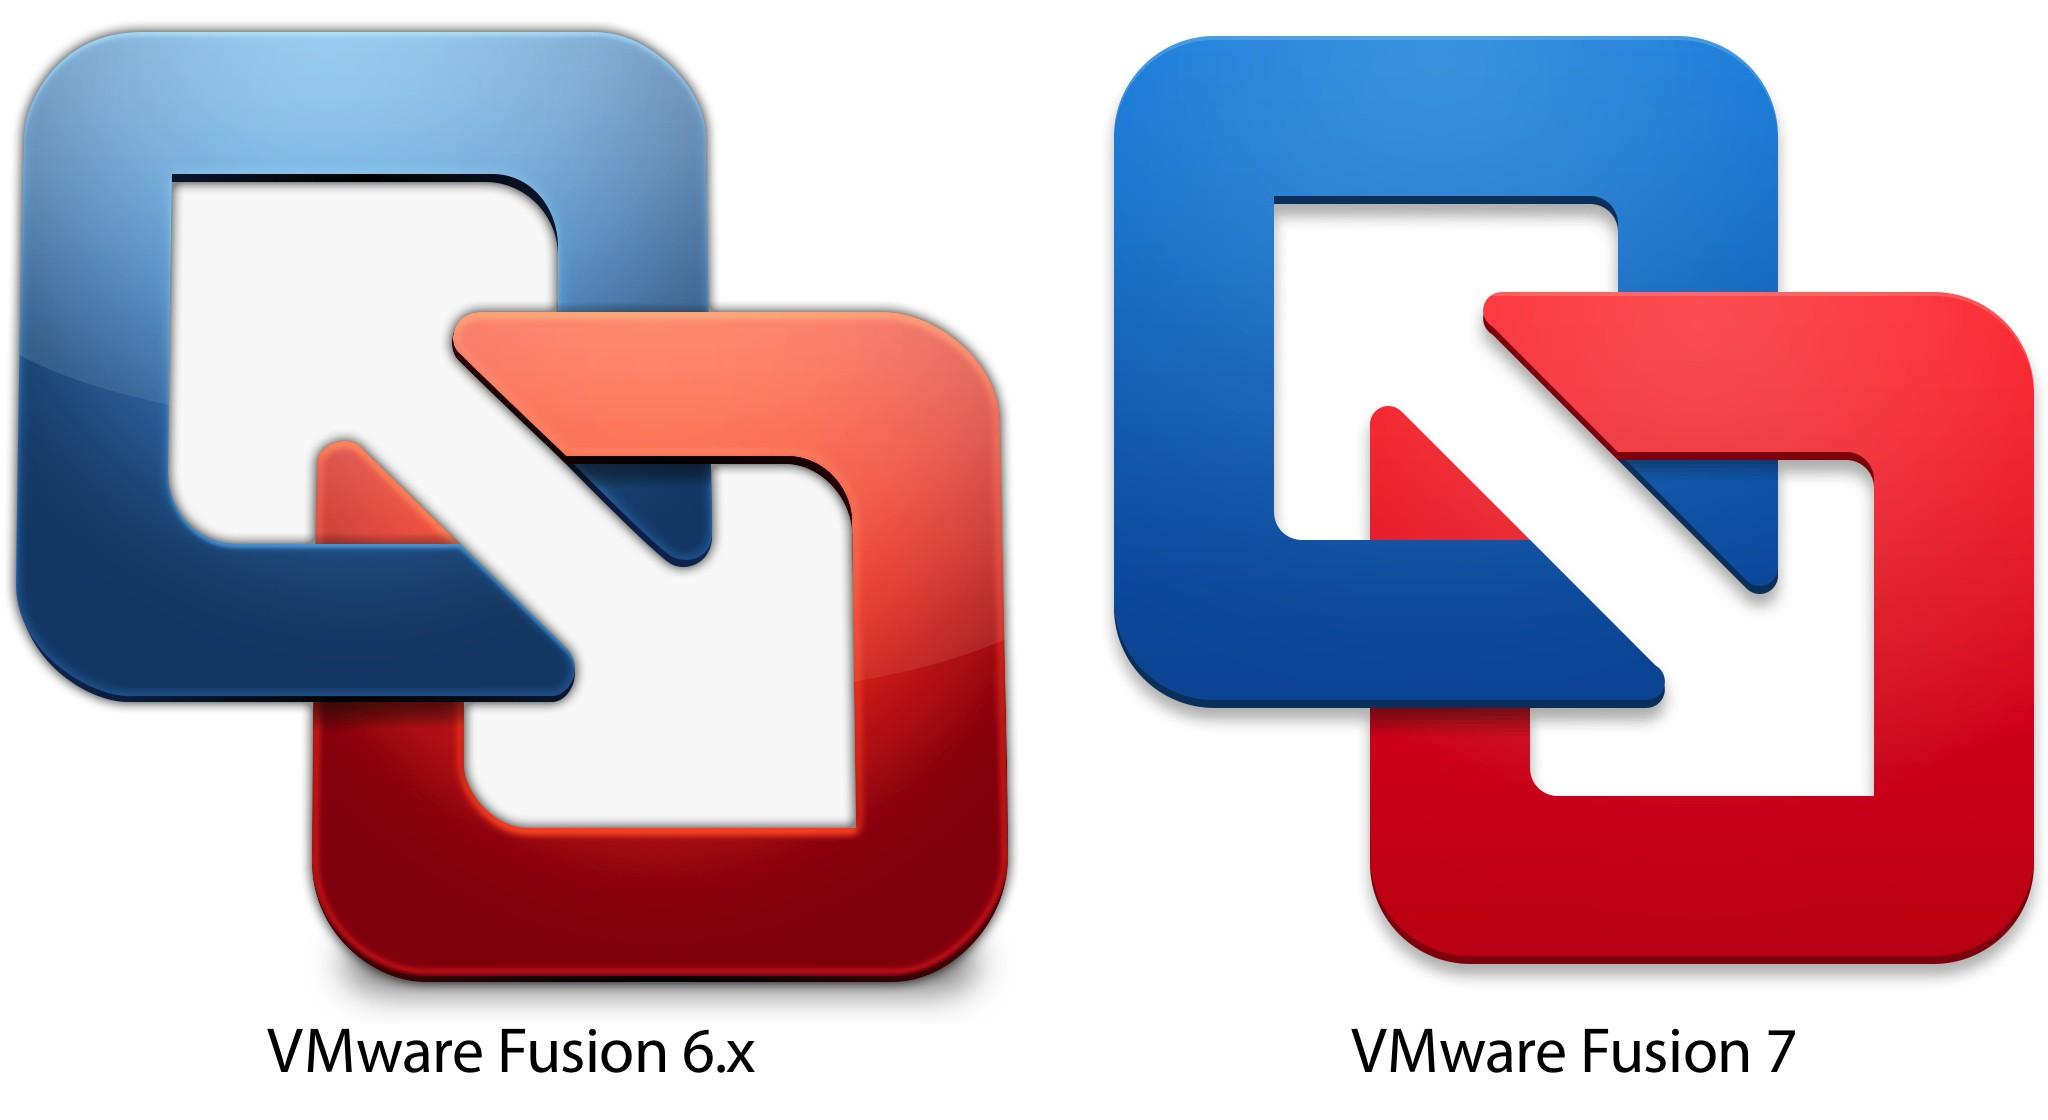 vmware mac用仮想環境構築アプリ vmware fusion pro 7 をリリース